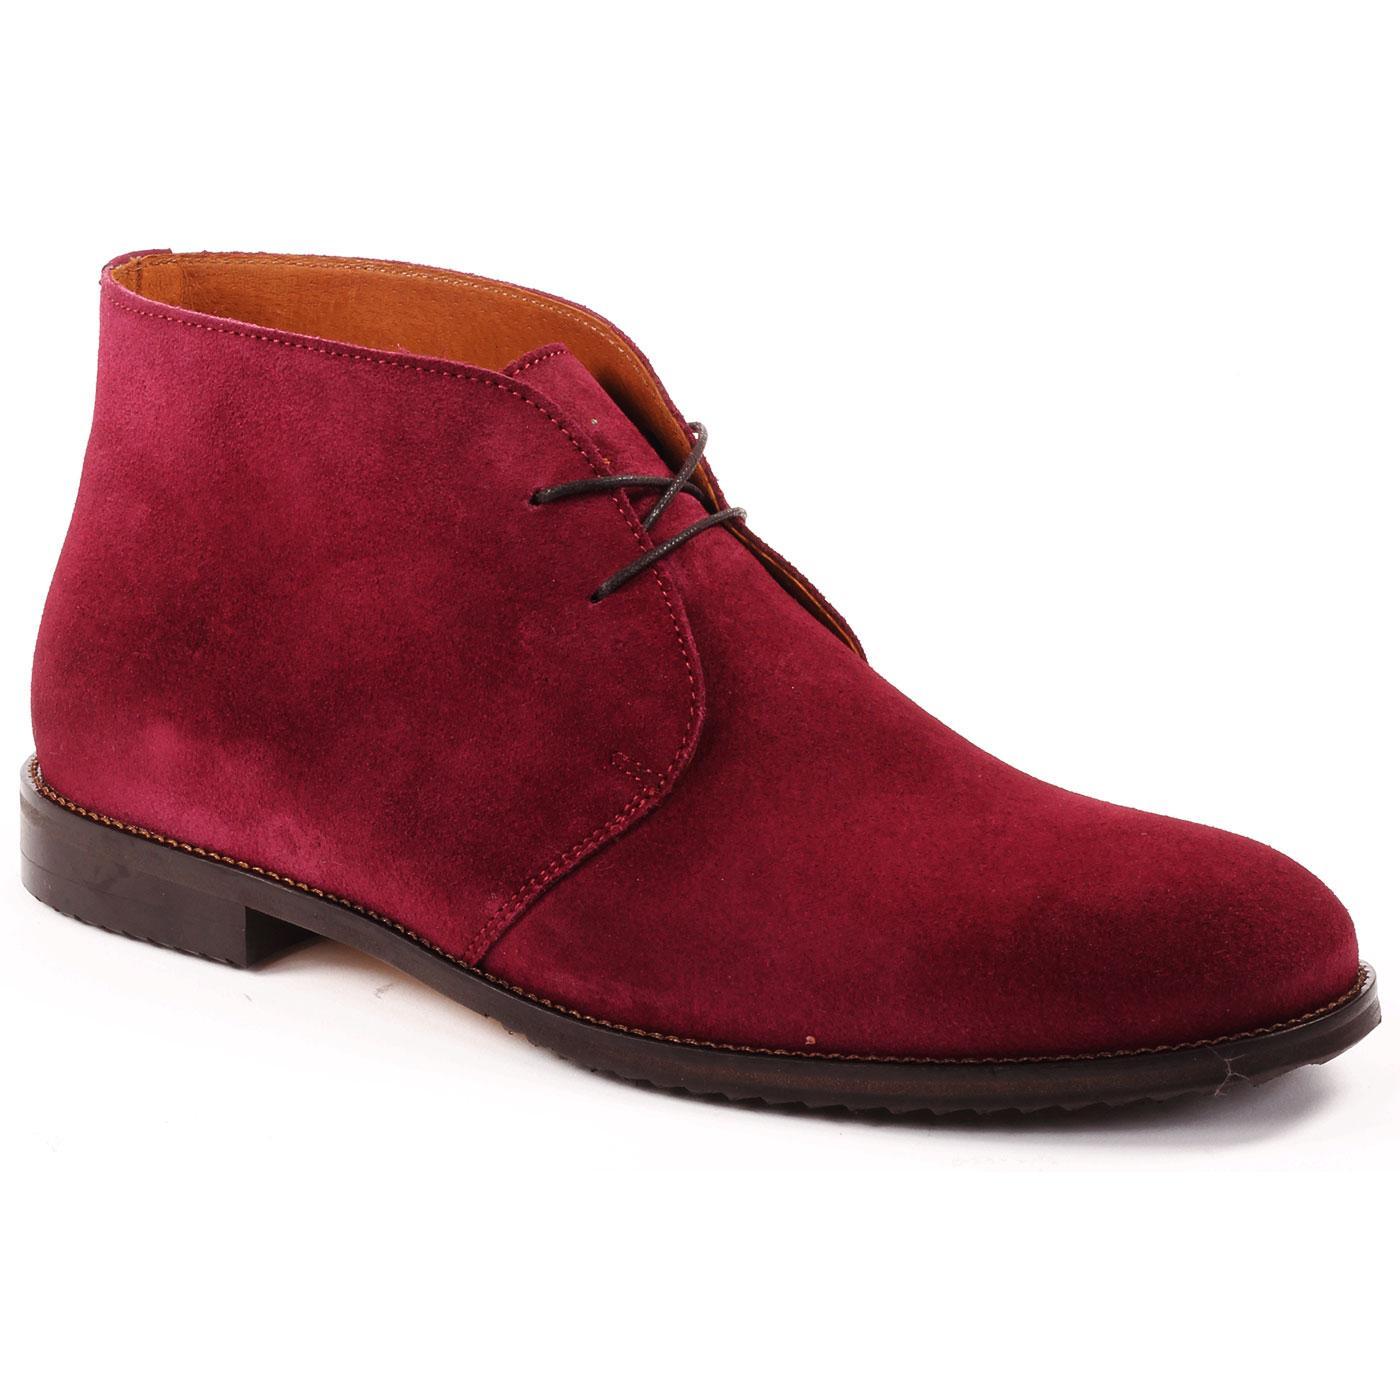 LACUZZO Men's Retro Mod Suede Chukka Boots CLARET